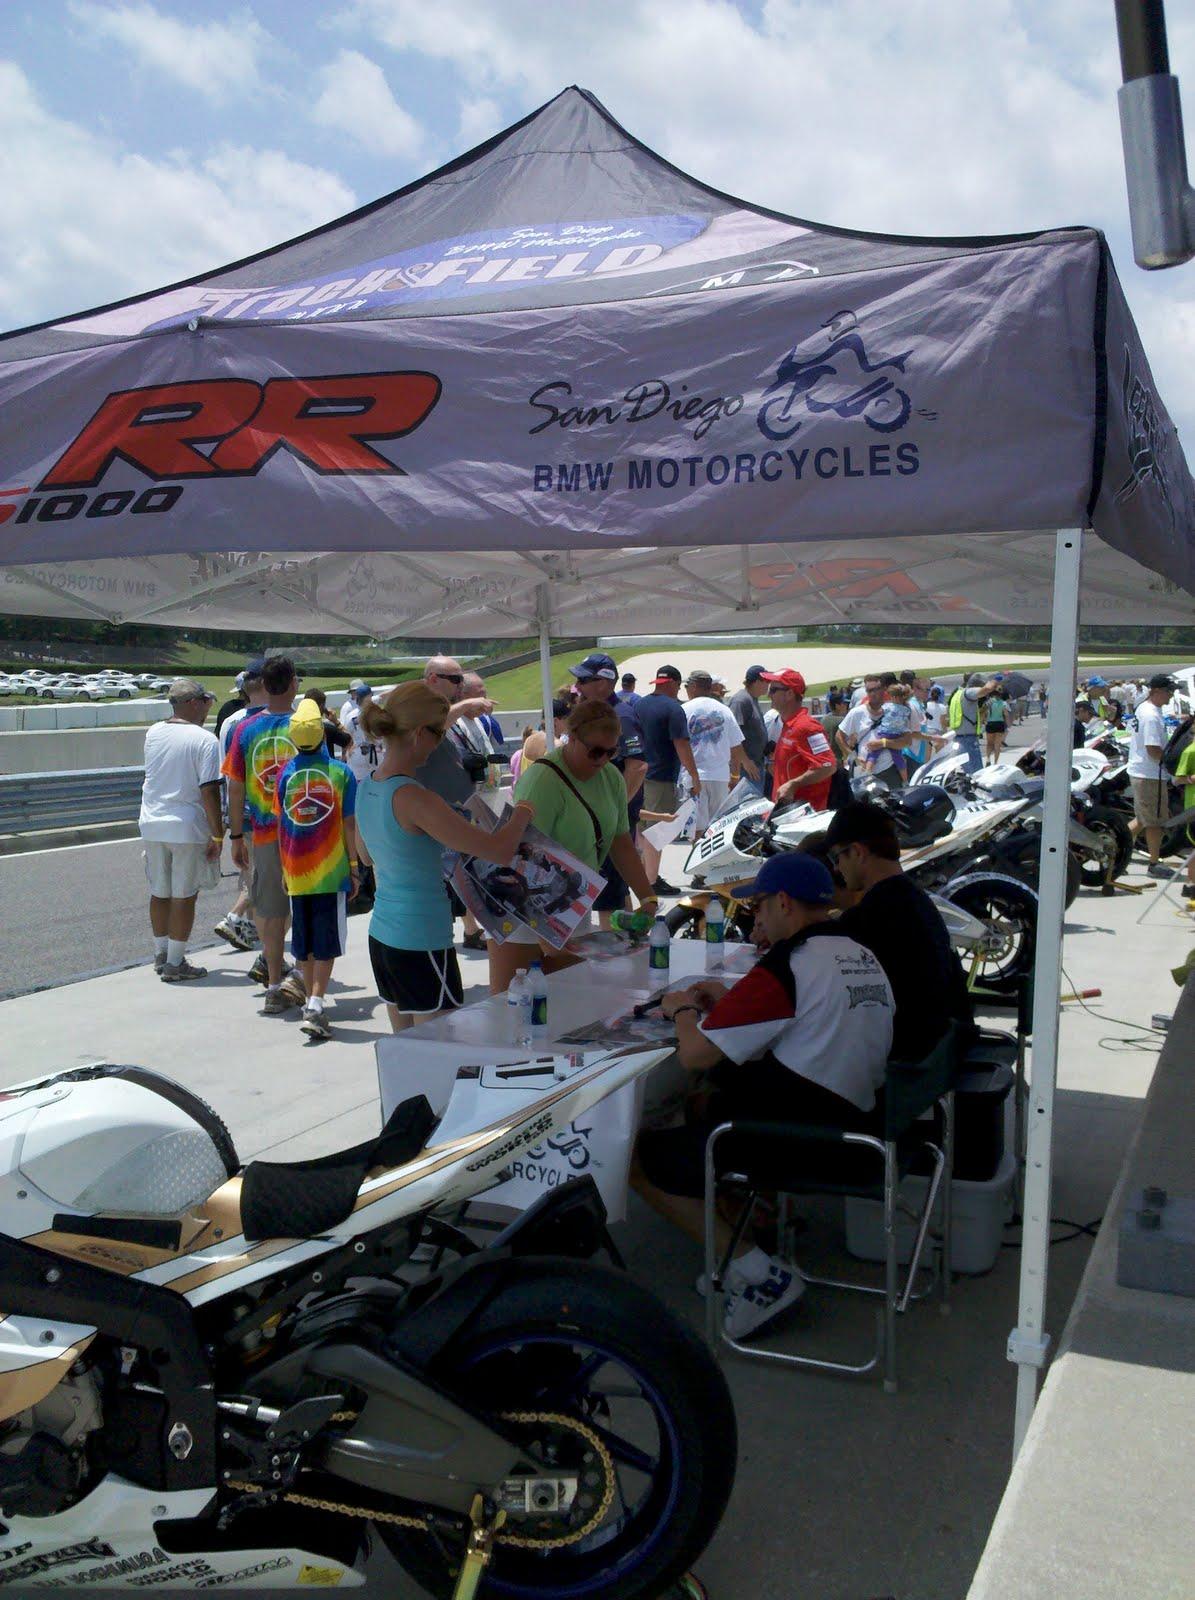 San Diego BMW Motorcycle Racing - S 1000 RR